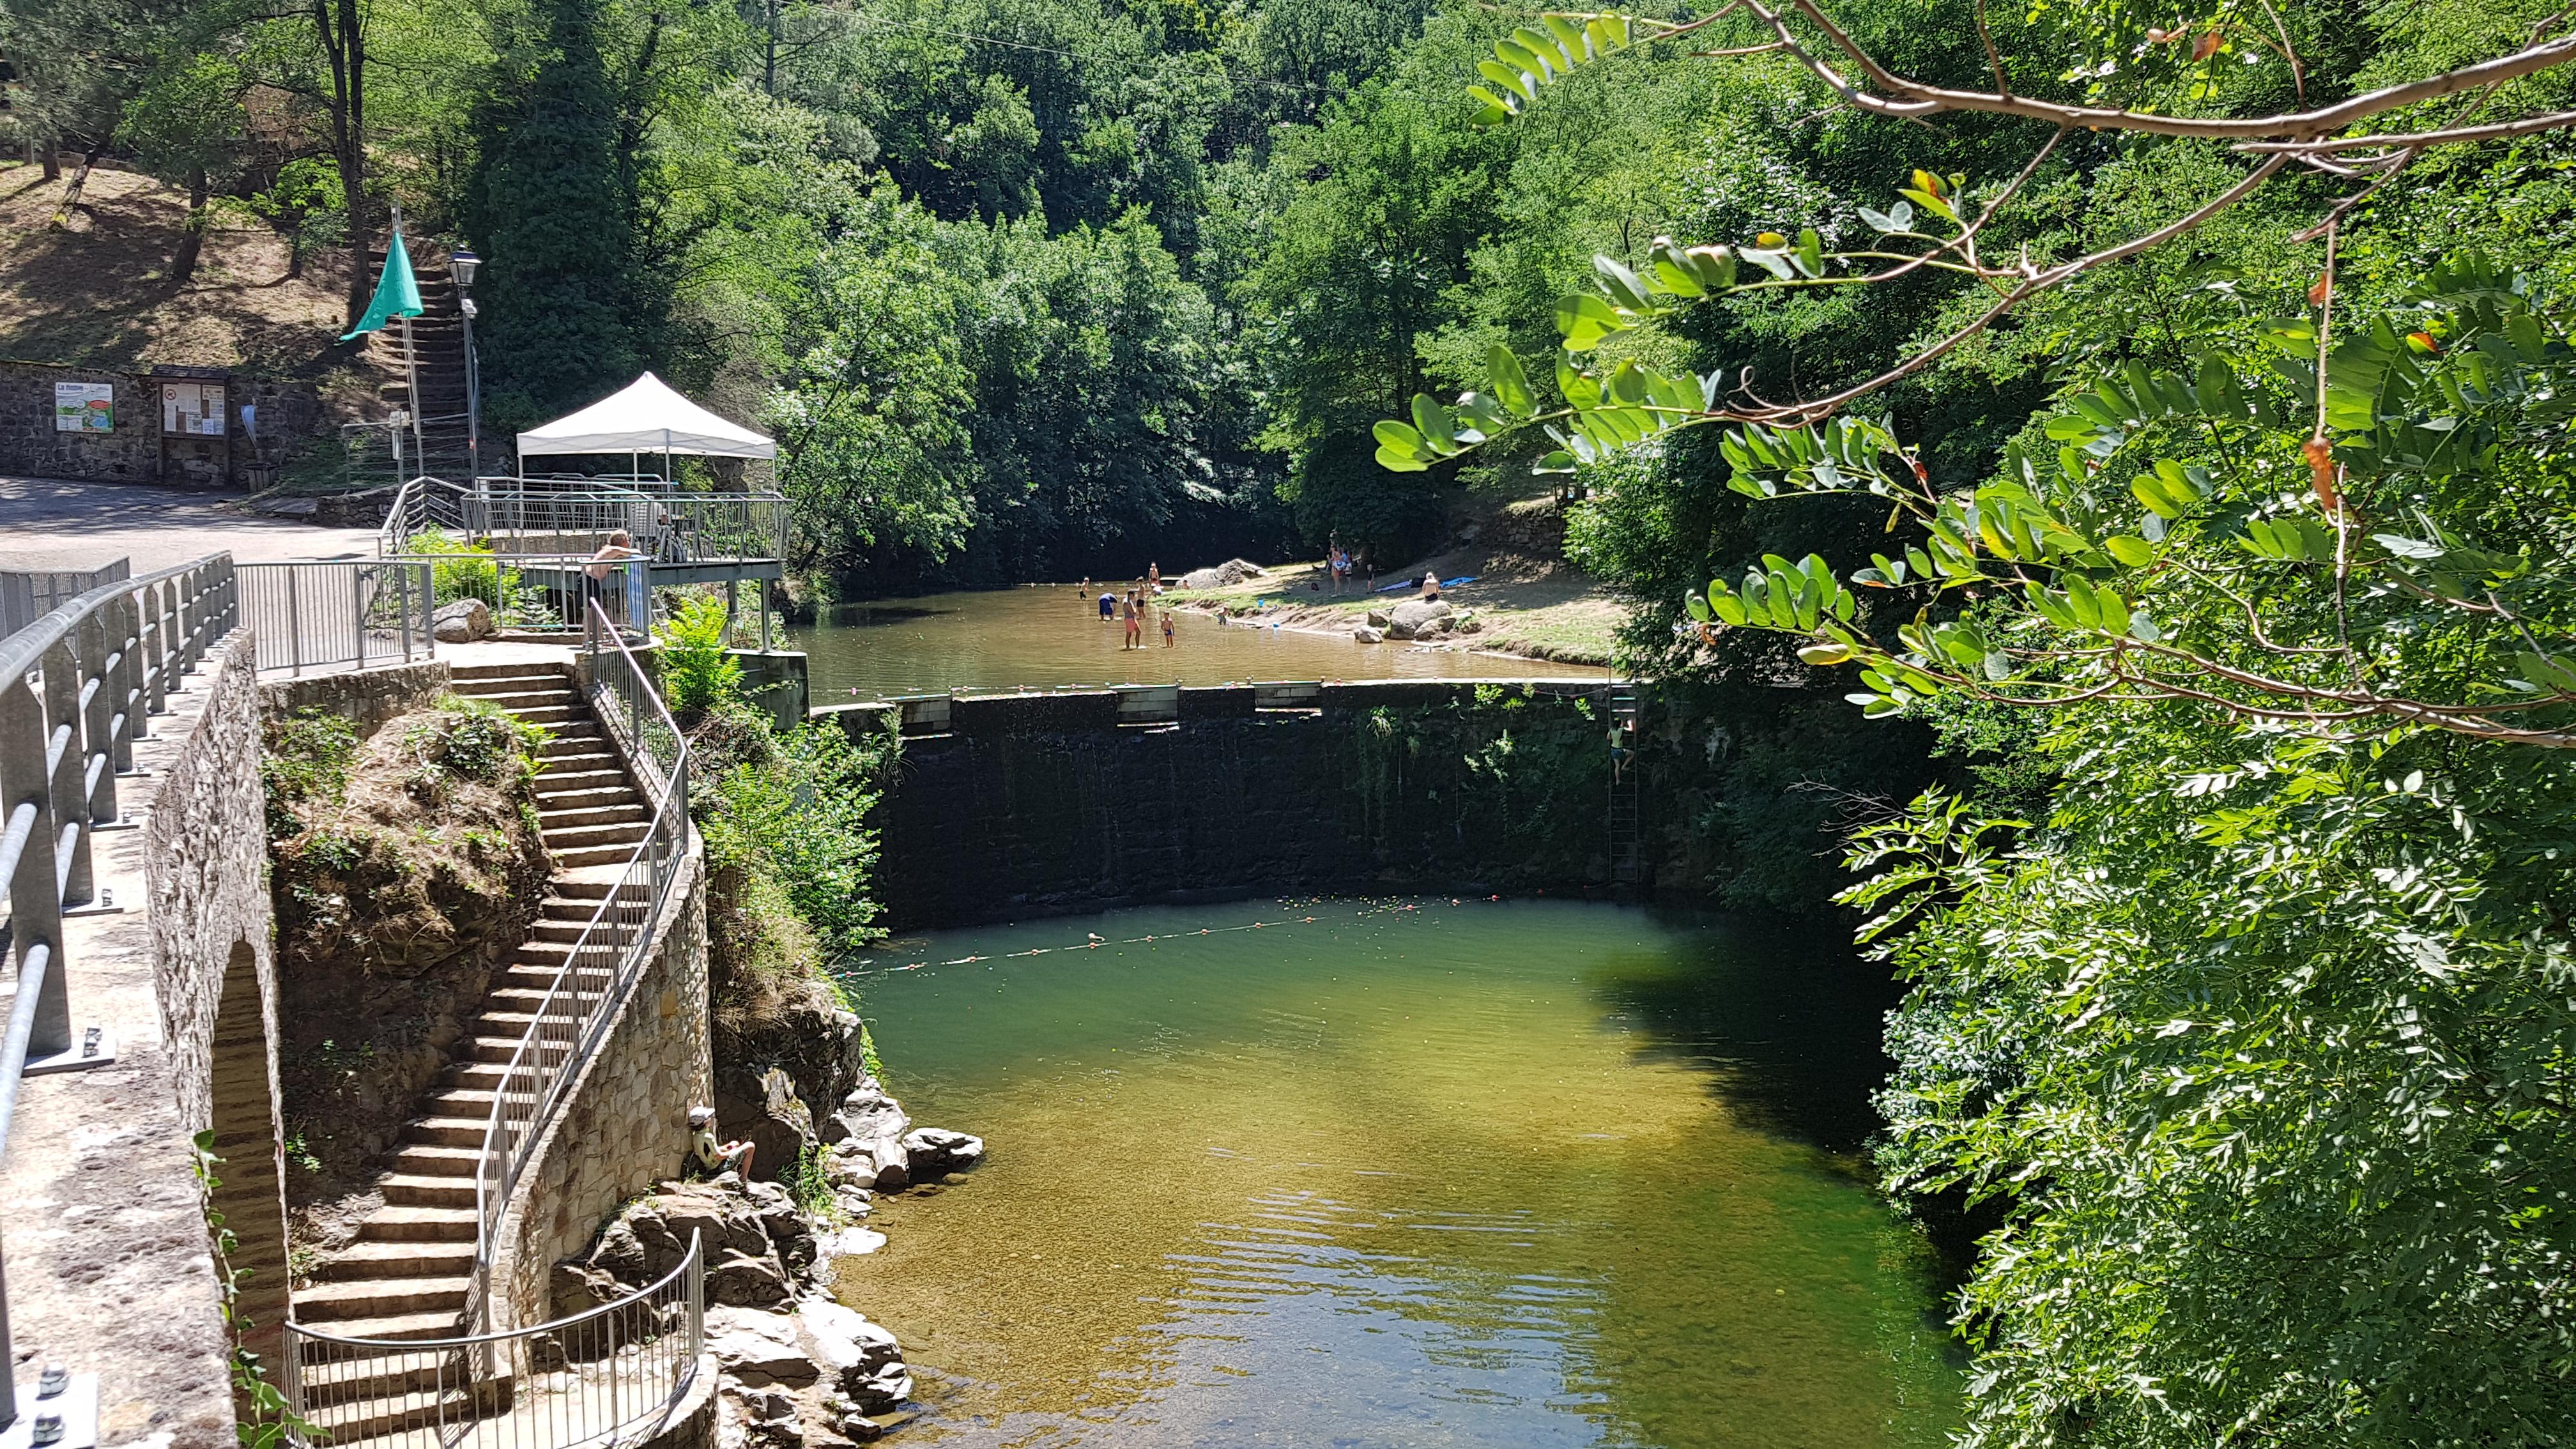 Swimming : La Neuve bathing site